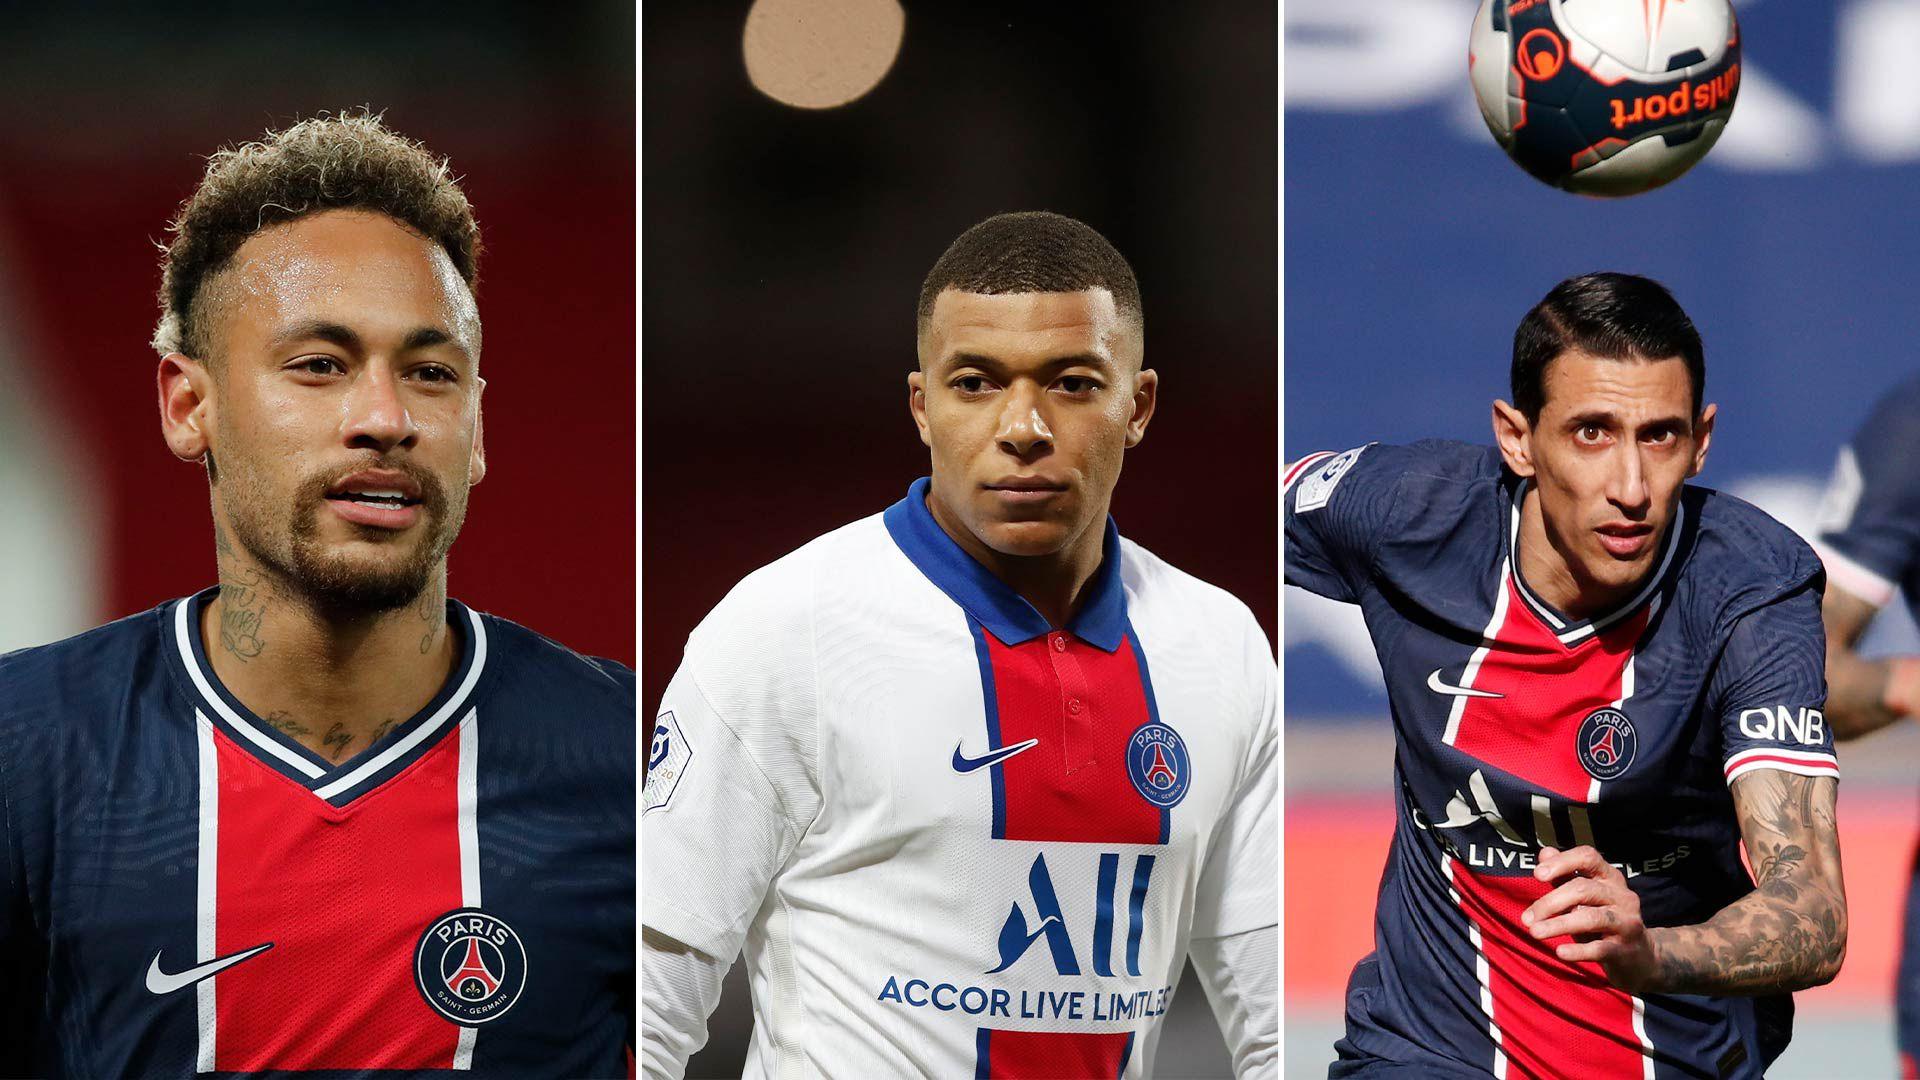 Fichajes más caros PSG Neymar Mbappe Di Maria